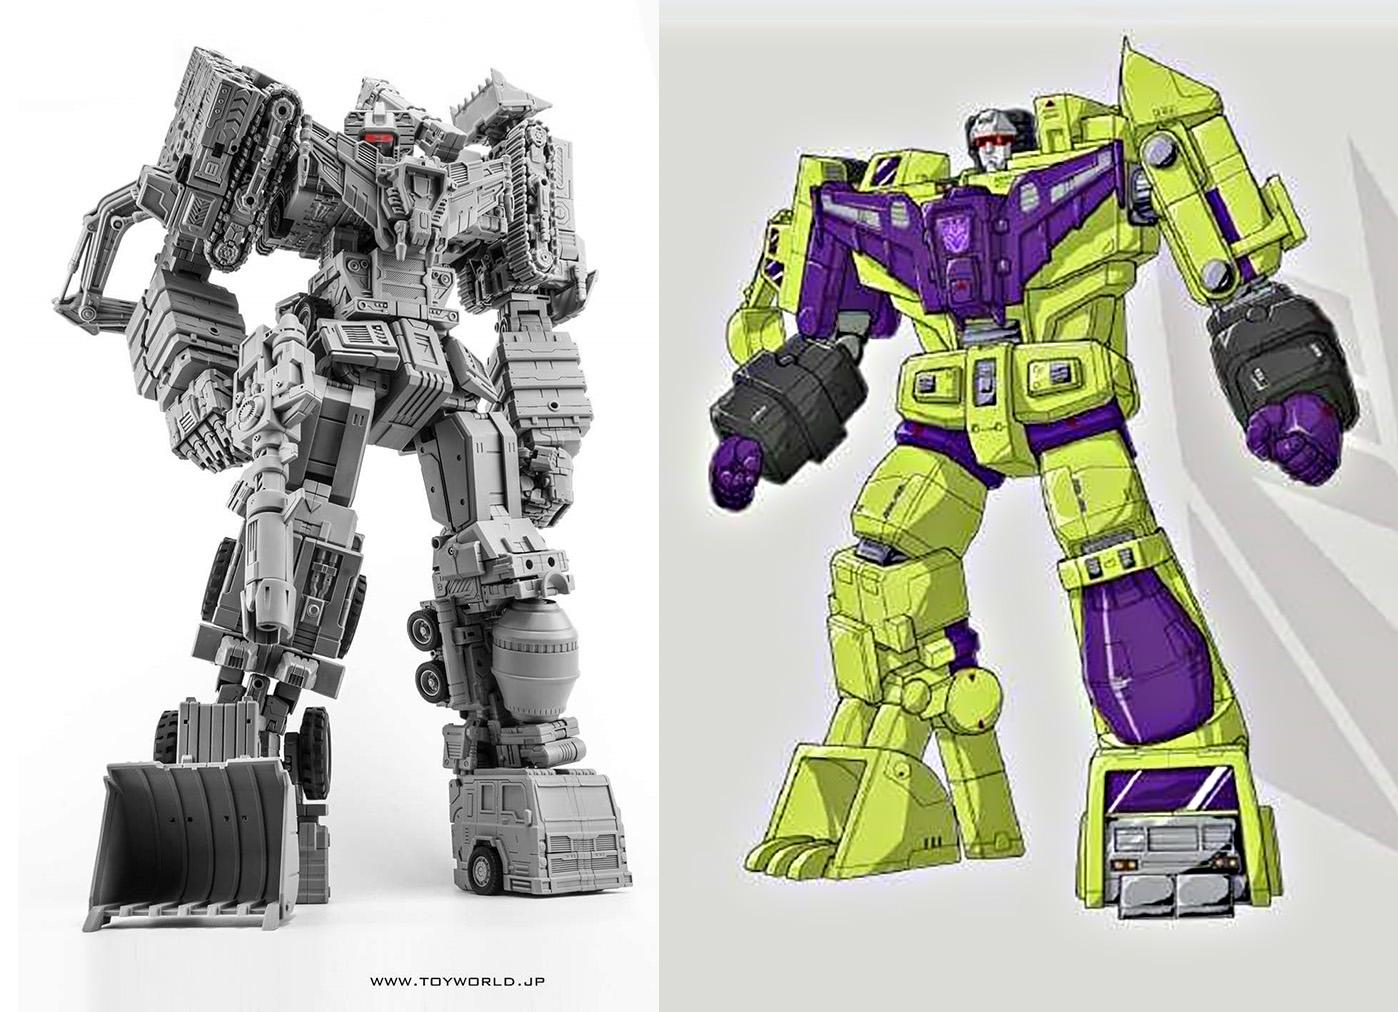 [Toyworld] Produit Tiers - Jouet TW-C Constructor aka Devastator/Dévastateur (Version vert G1 et jaune G2) - Page 2 ZLKHdHqO